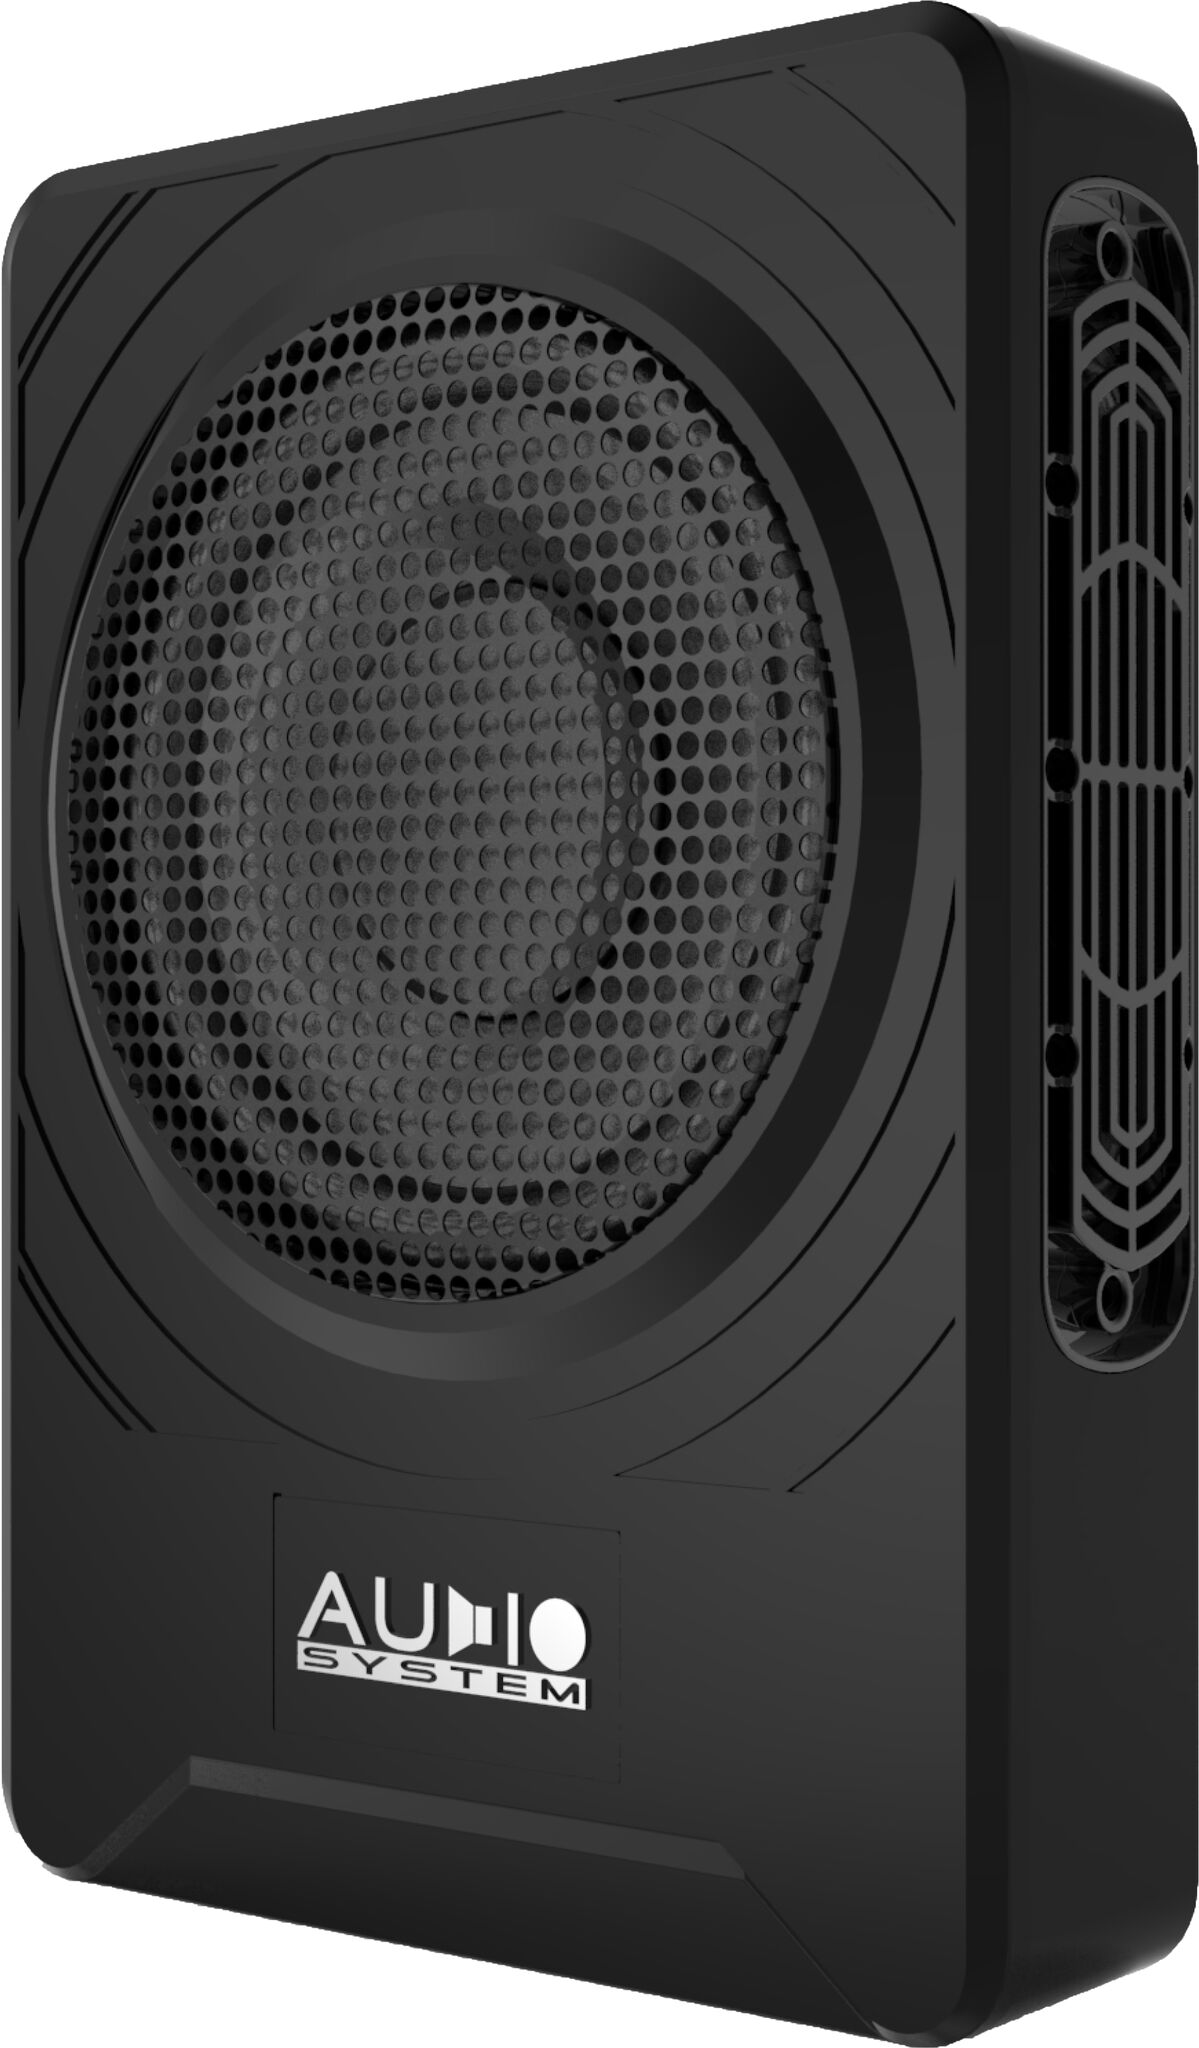 audio system us08 aktiv subwoofer flach untersitz acr. Black Bedroom Furniture Sets. Home Design Ideas